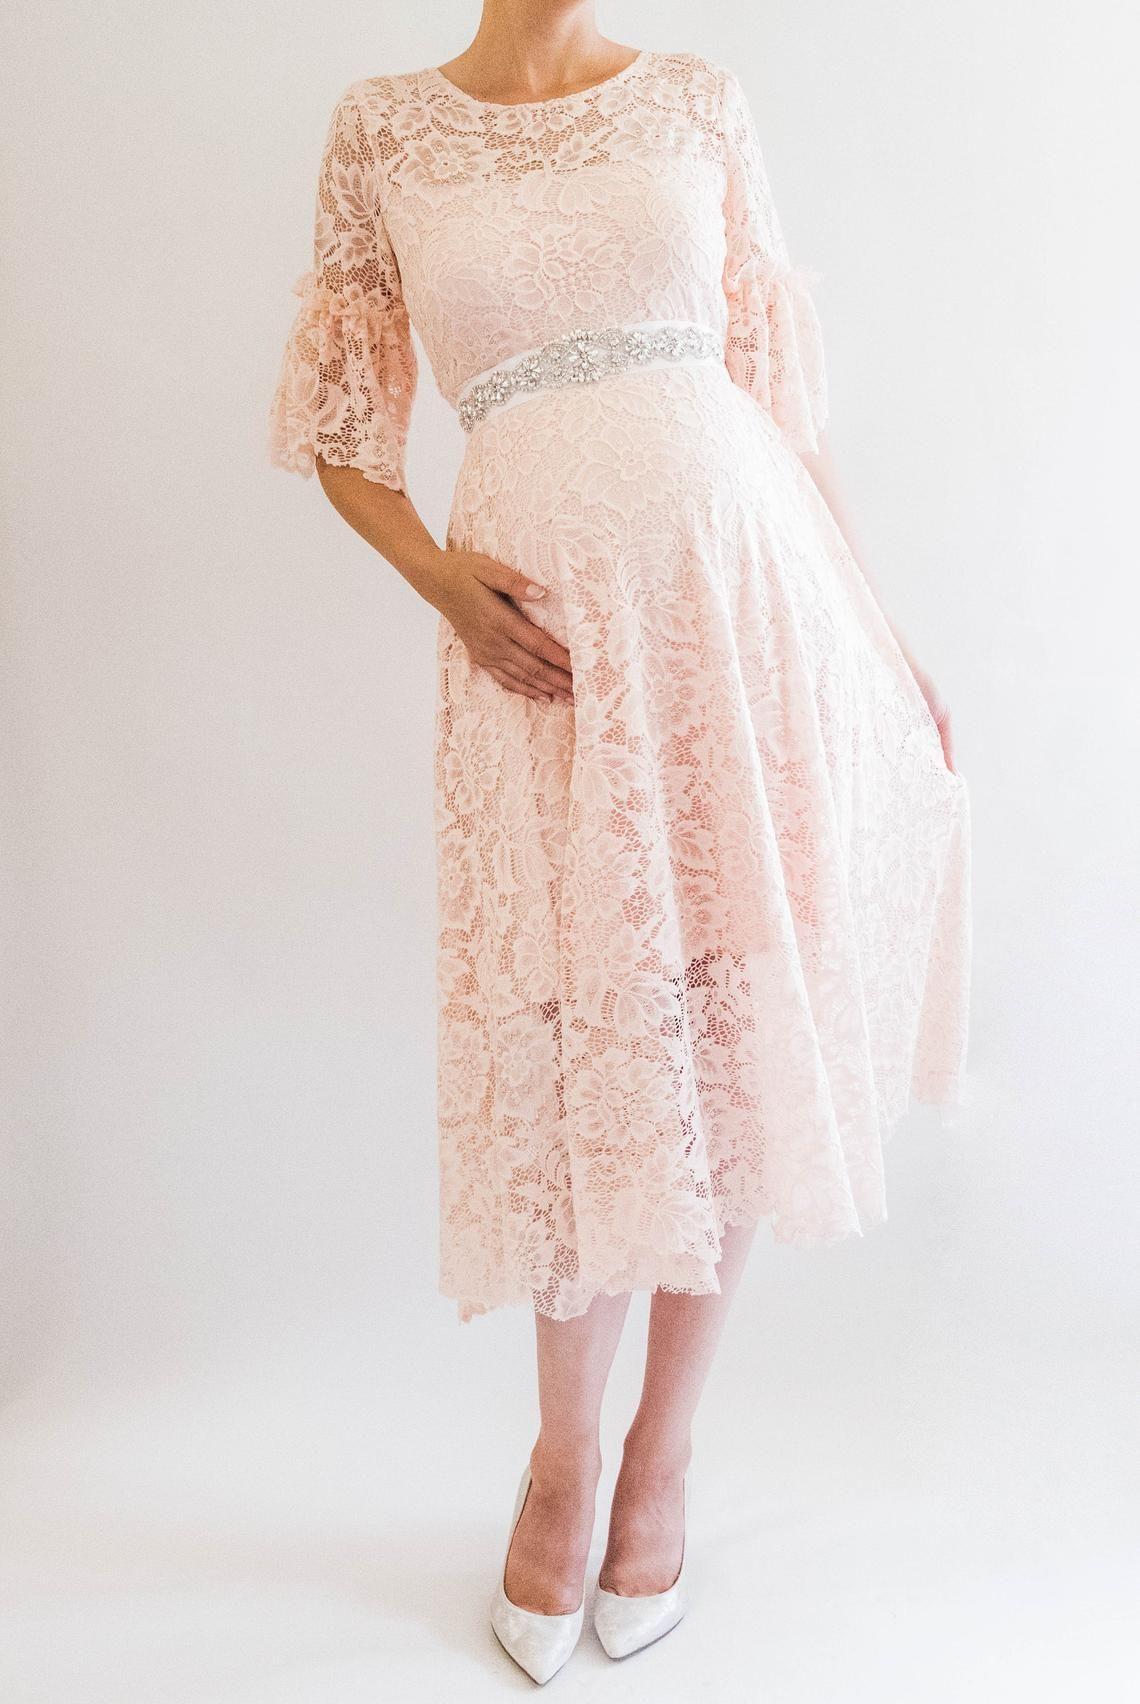 Chloe Lace Maternity Dress Baby Shower Bridesmaid Dress